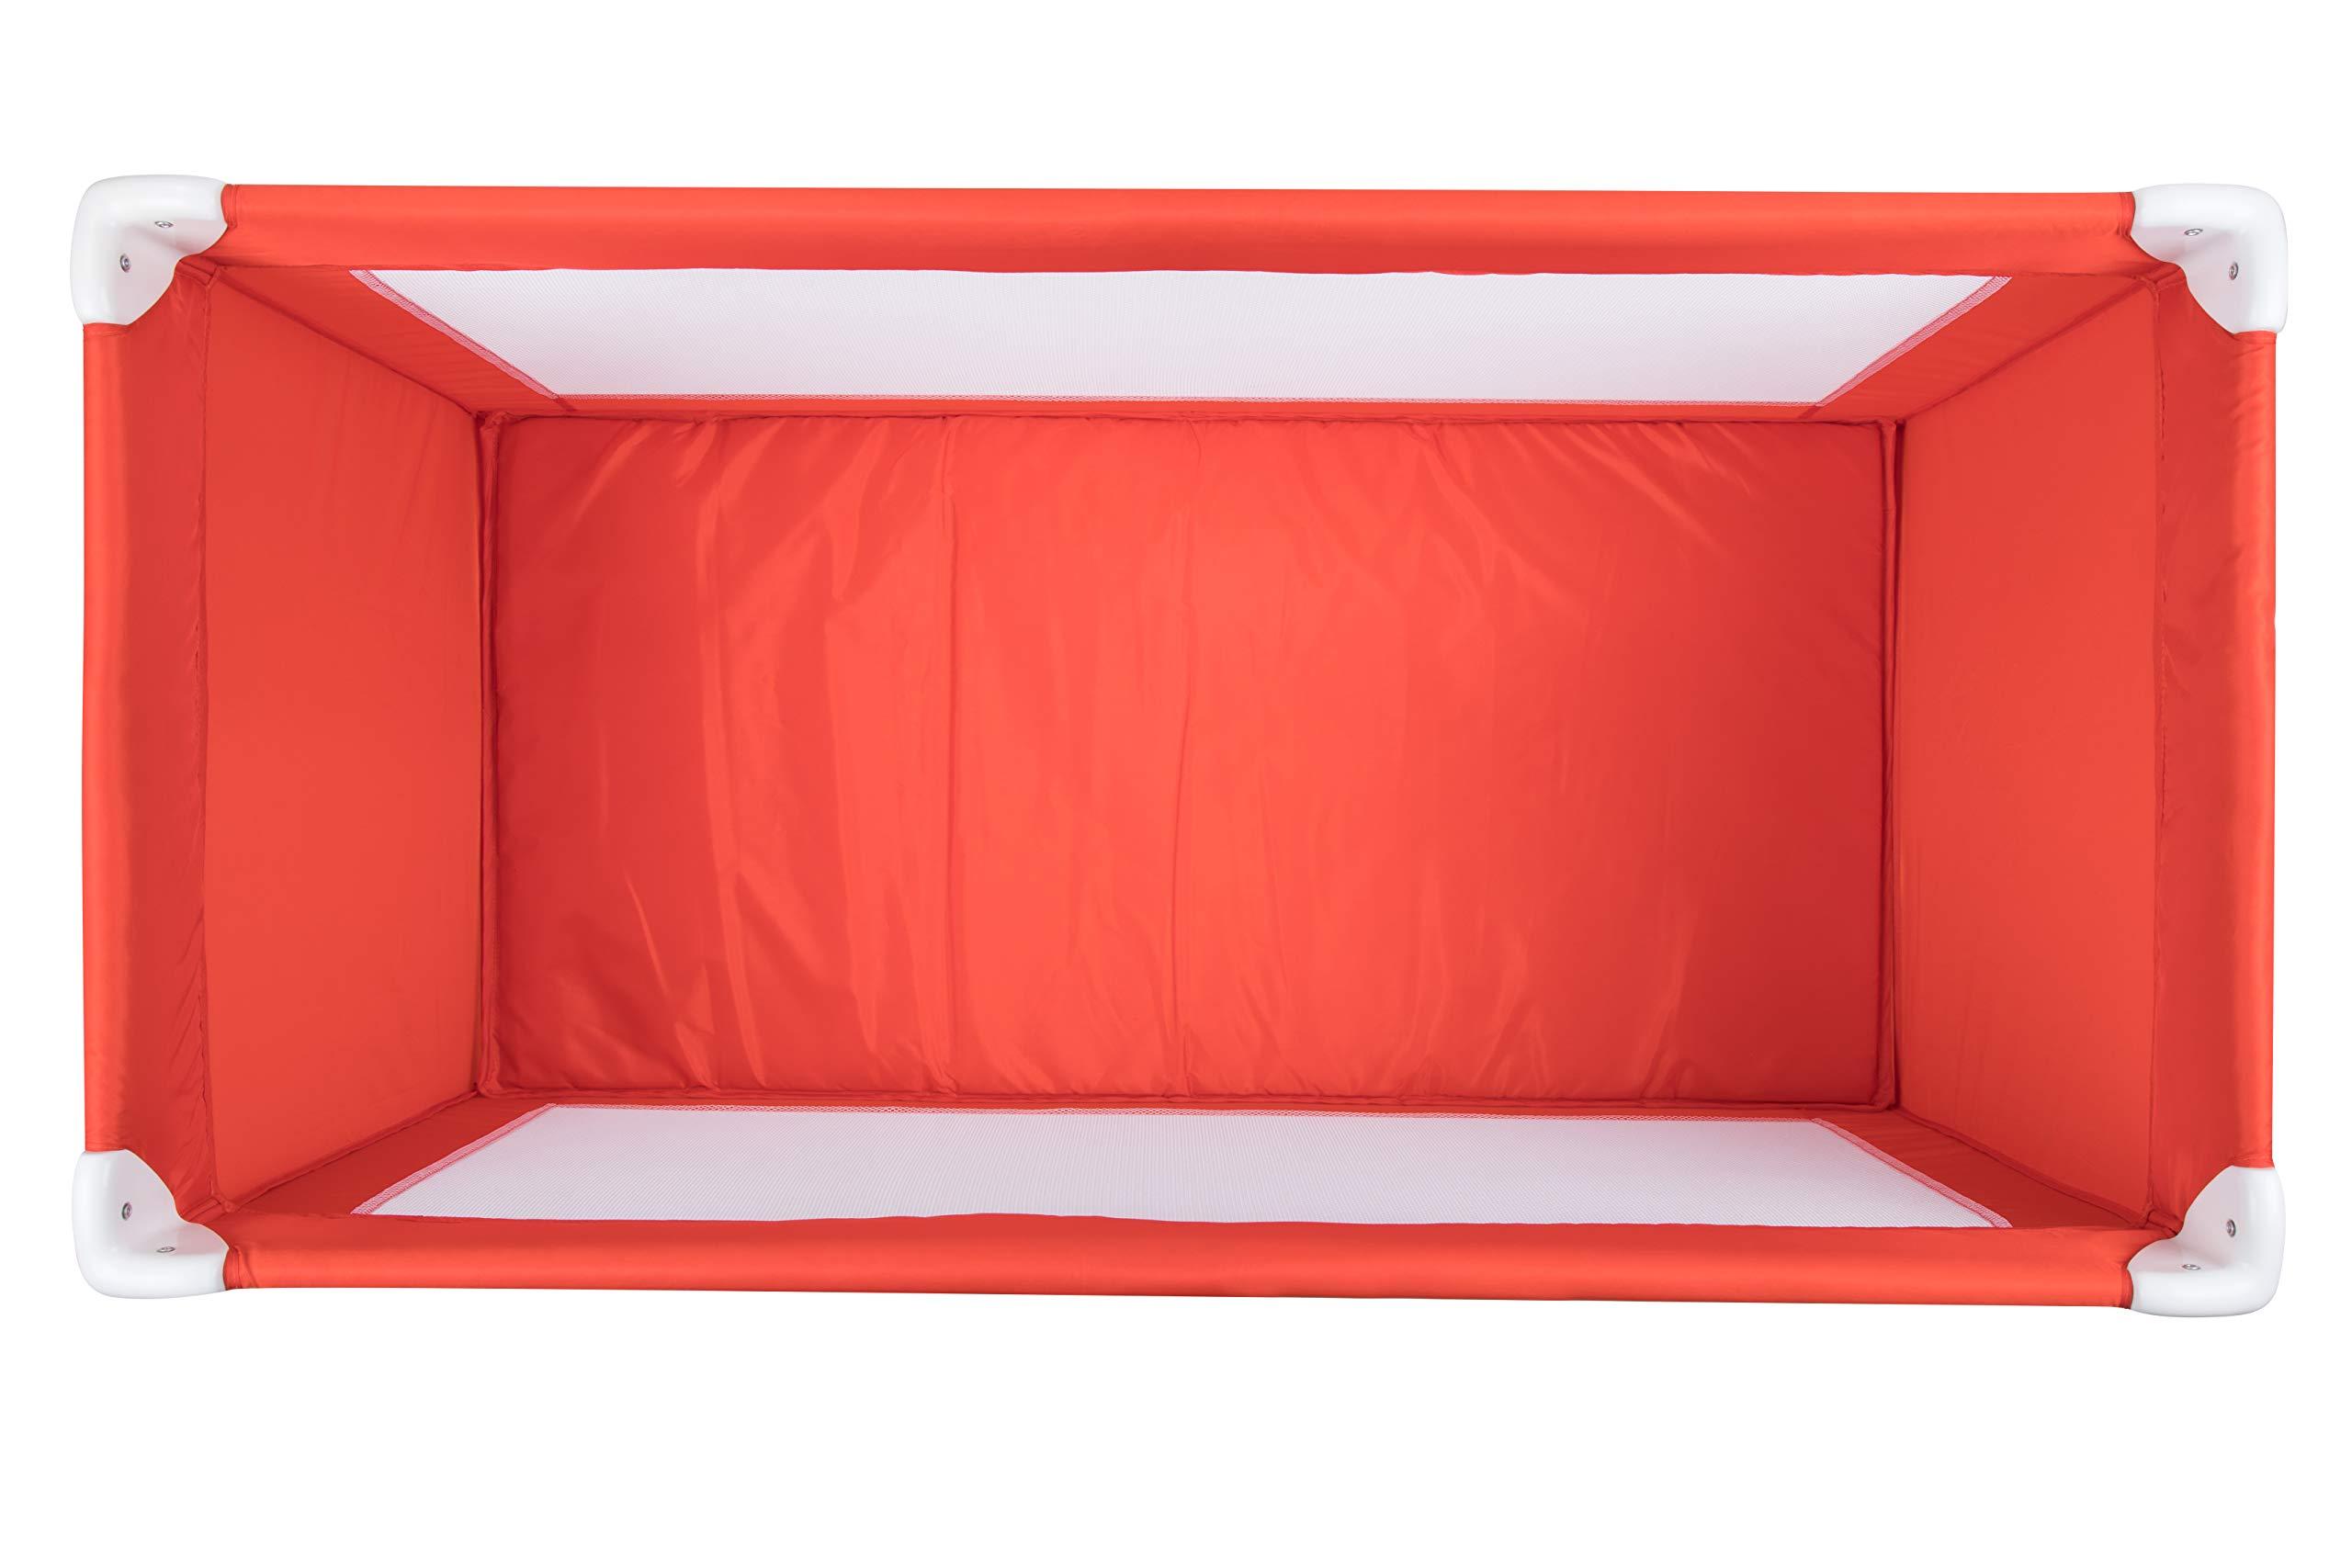 Safety 1st 2114260000 Soft Dreams Travel Umbrella Bed Red Lines  DORA3